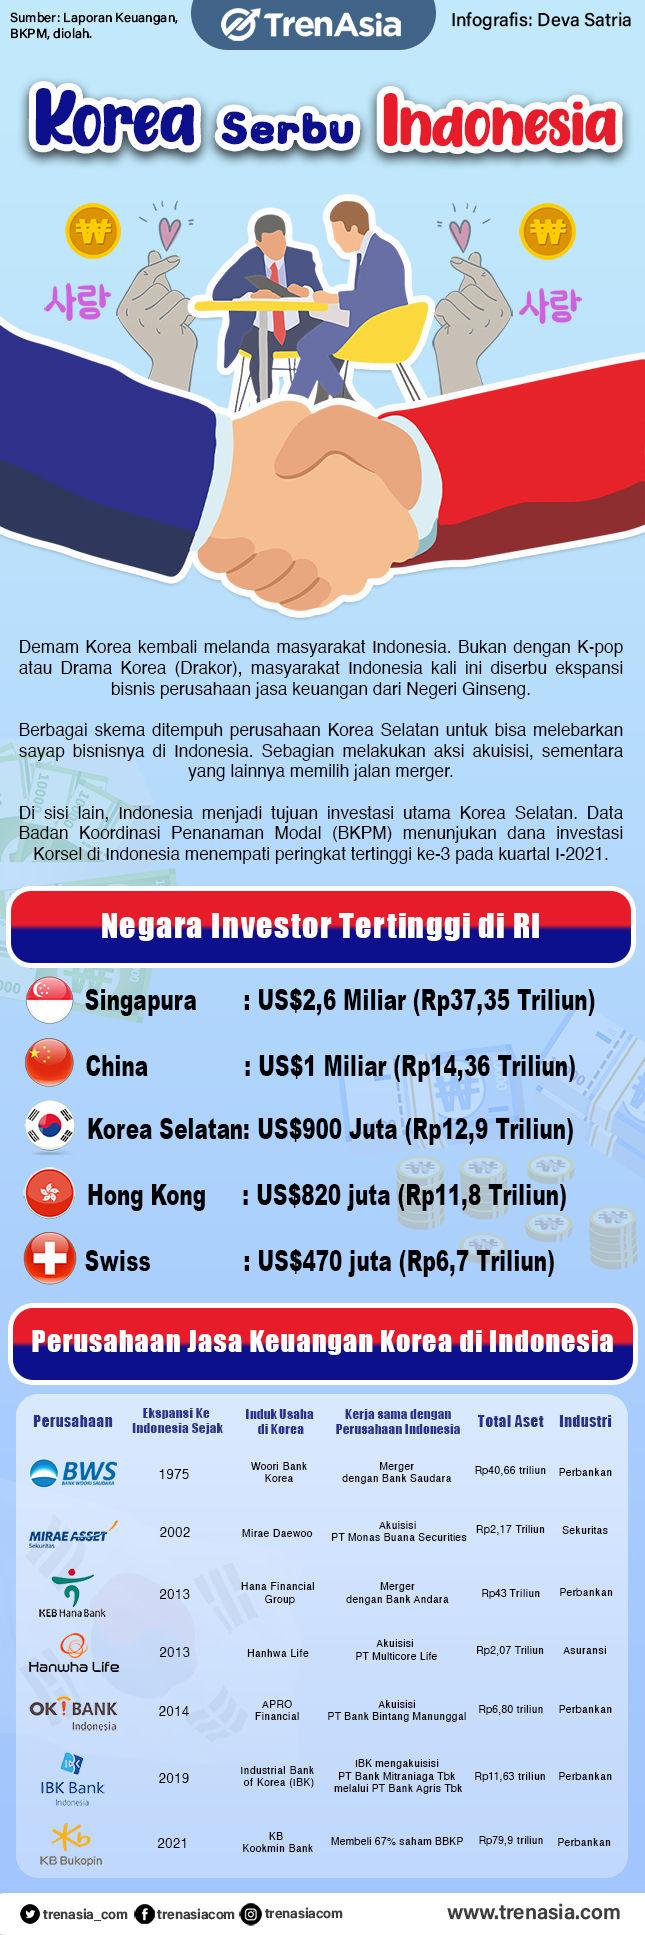 Korea Serbu Indonesia.jpg